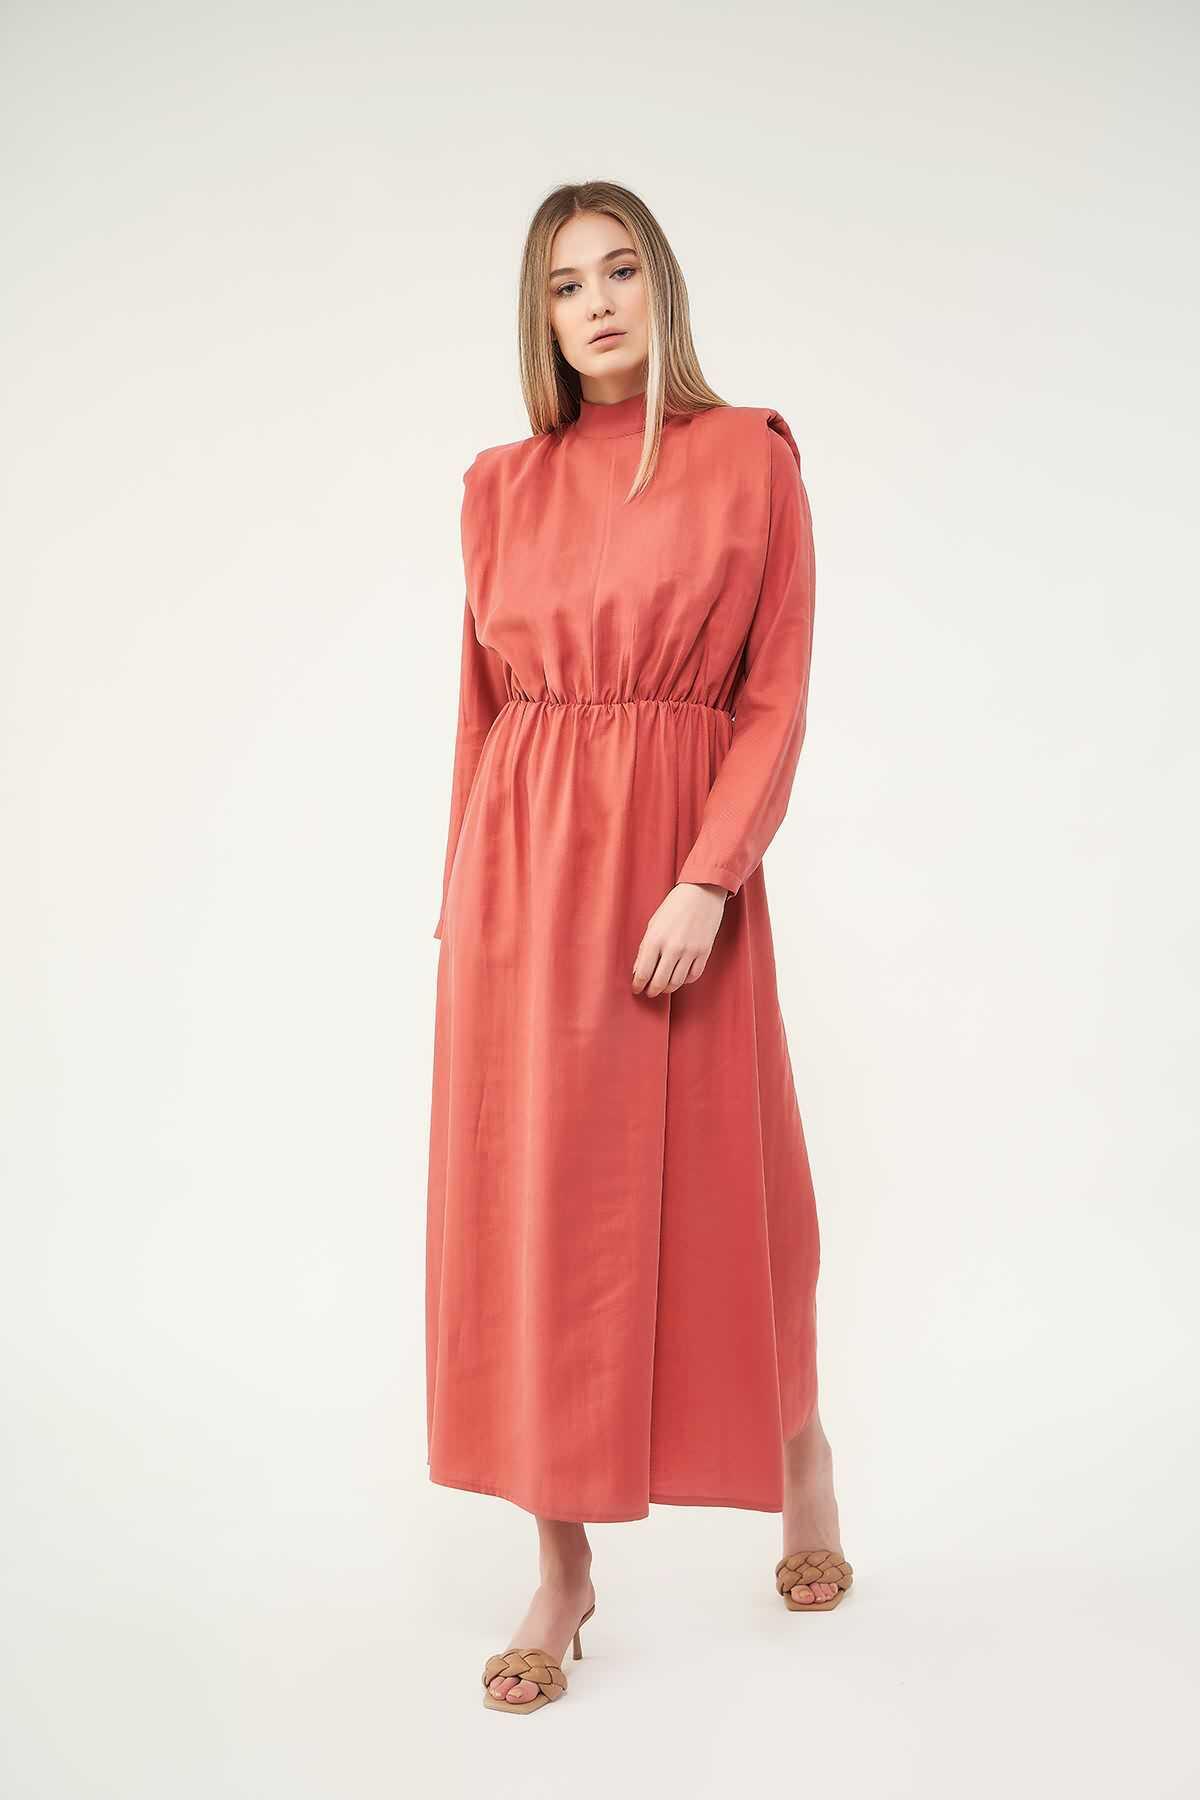 Mevra - Vatkalı Elbise Pudra